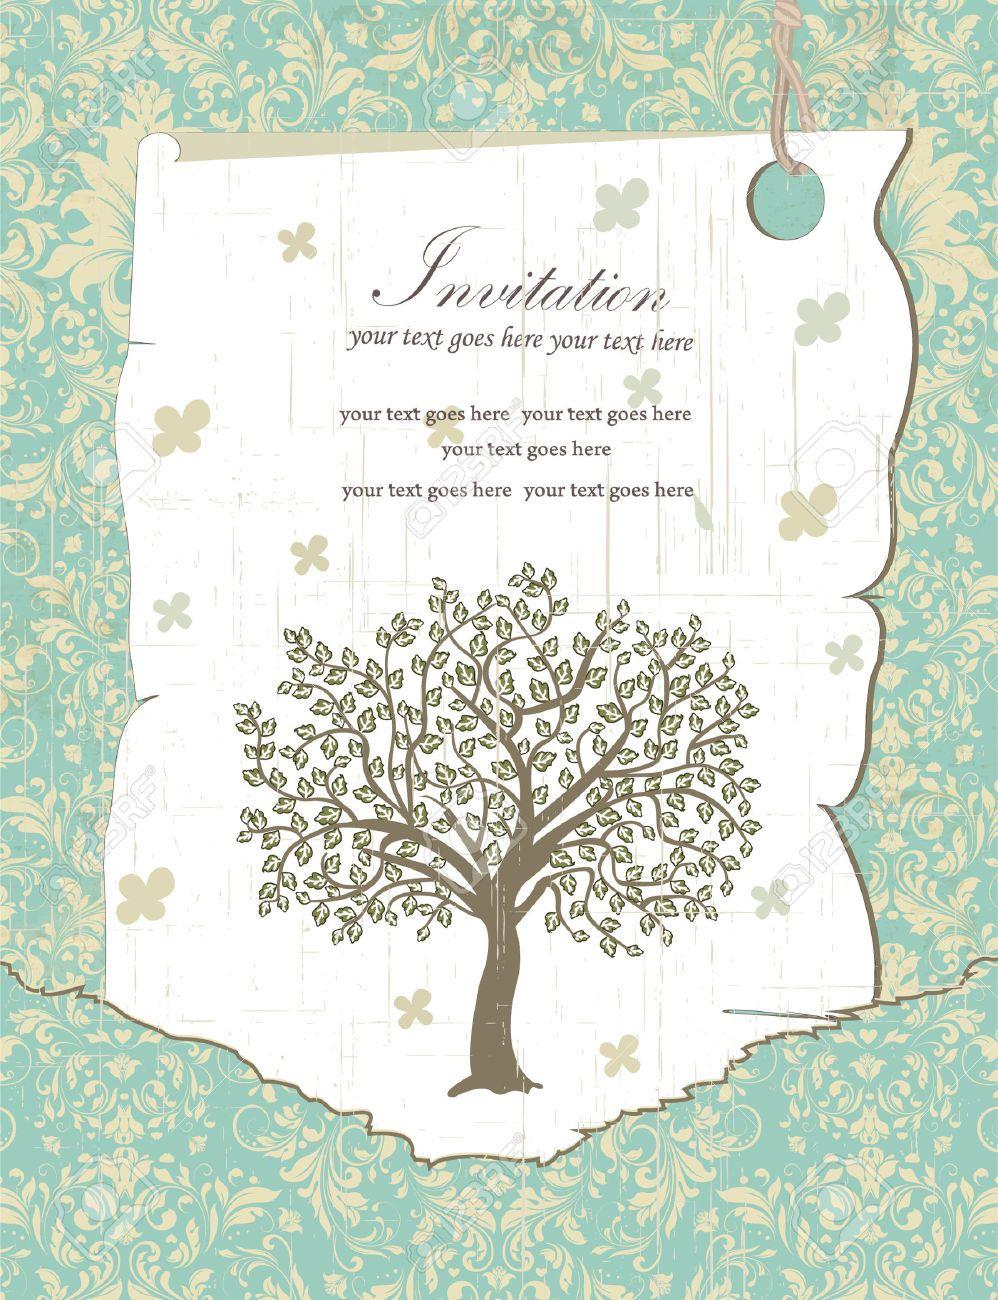 photograph regarding Free Printable Family Reunion Invitations identify Totally free Printable Household Reunion Templates  AHA Family members